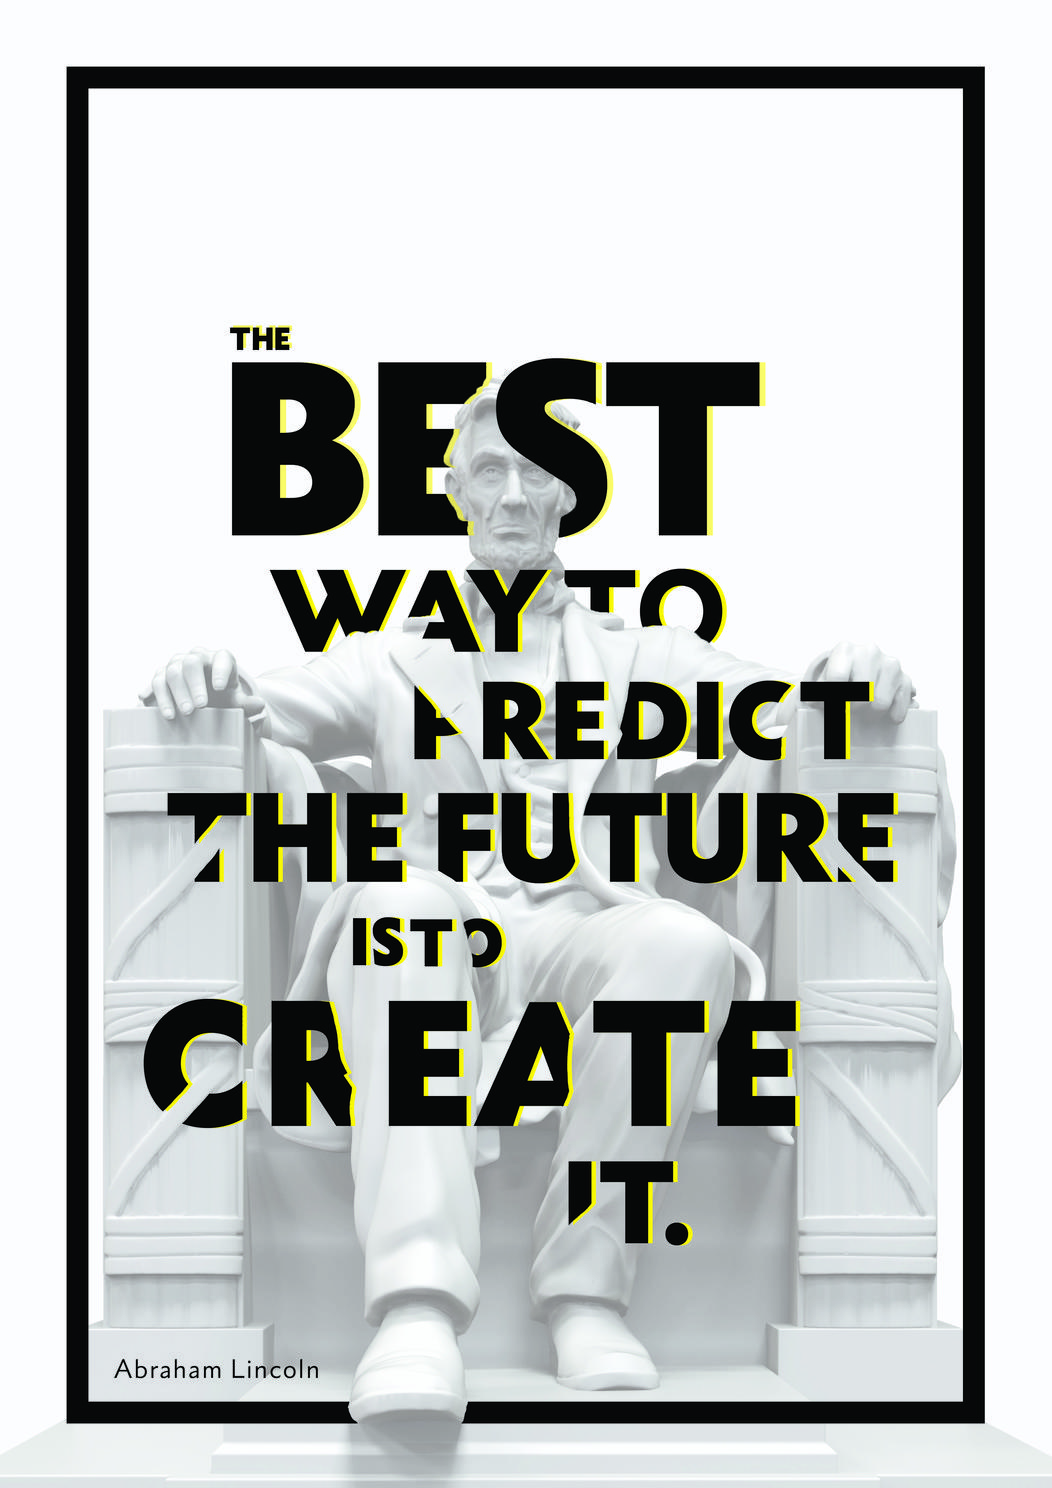 """BEST WAY 1'0 I- REDIC T THE FUTURE IST'J C R EA TE IT. Abraham https://inspirational.ly"